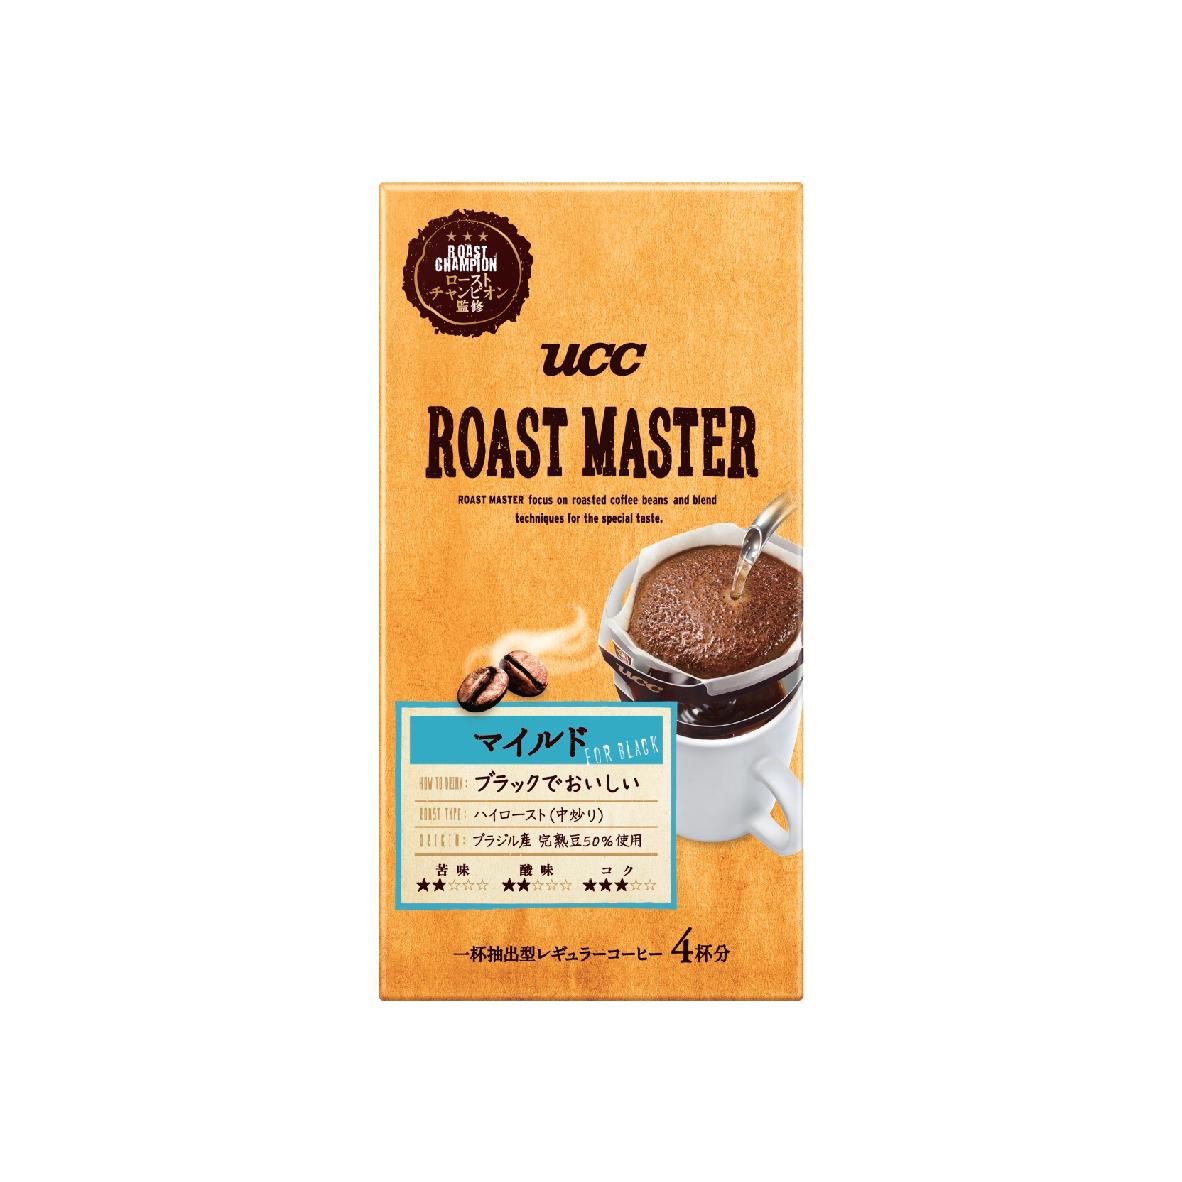 UCC Roast Master Mild Coffee Blend Drip Coffee